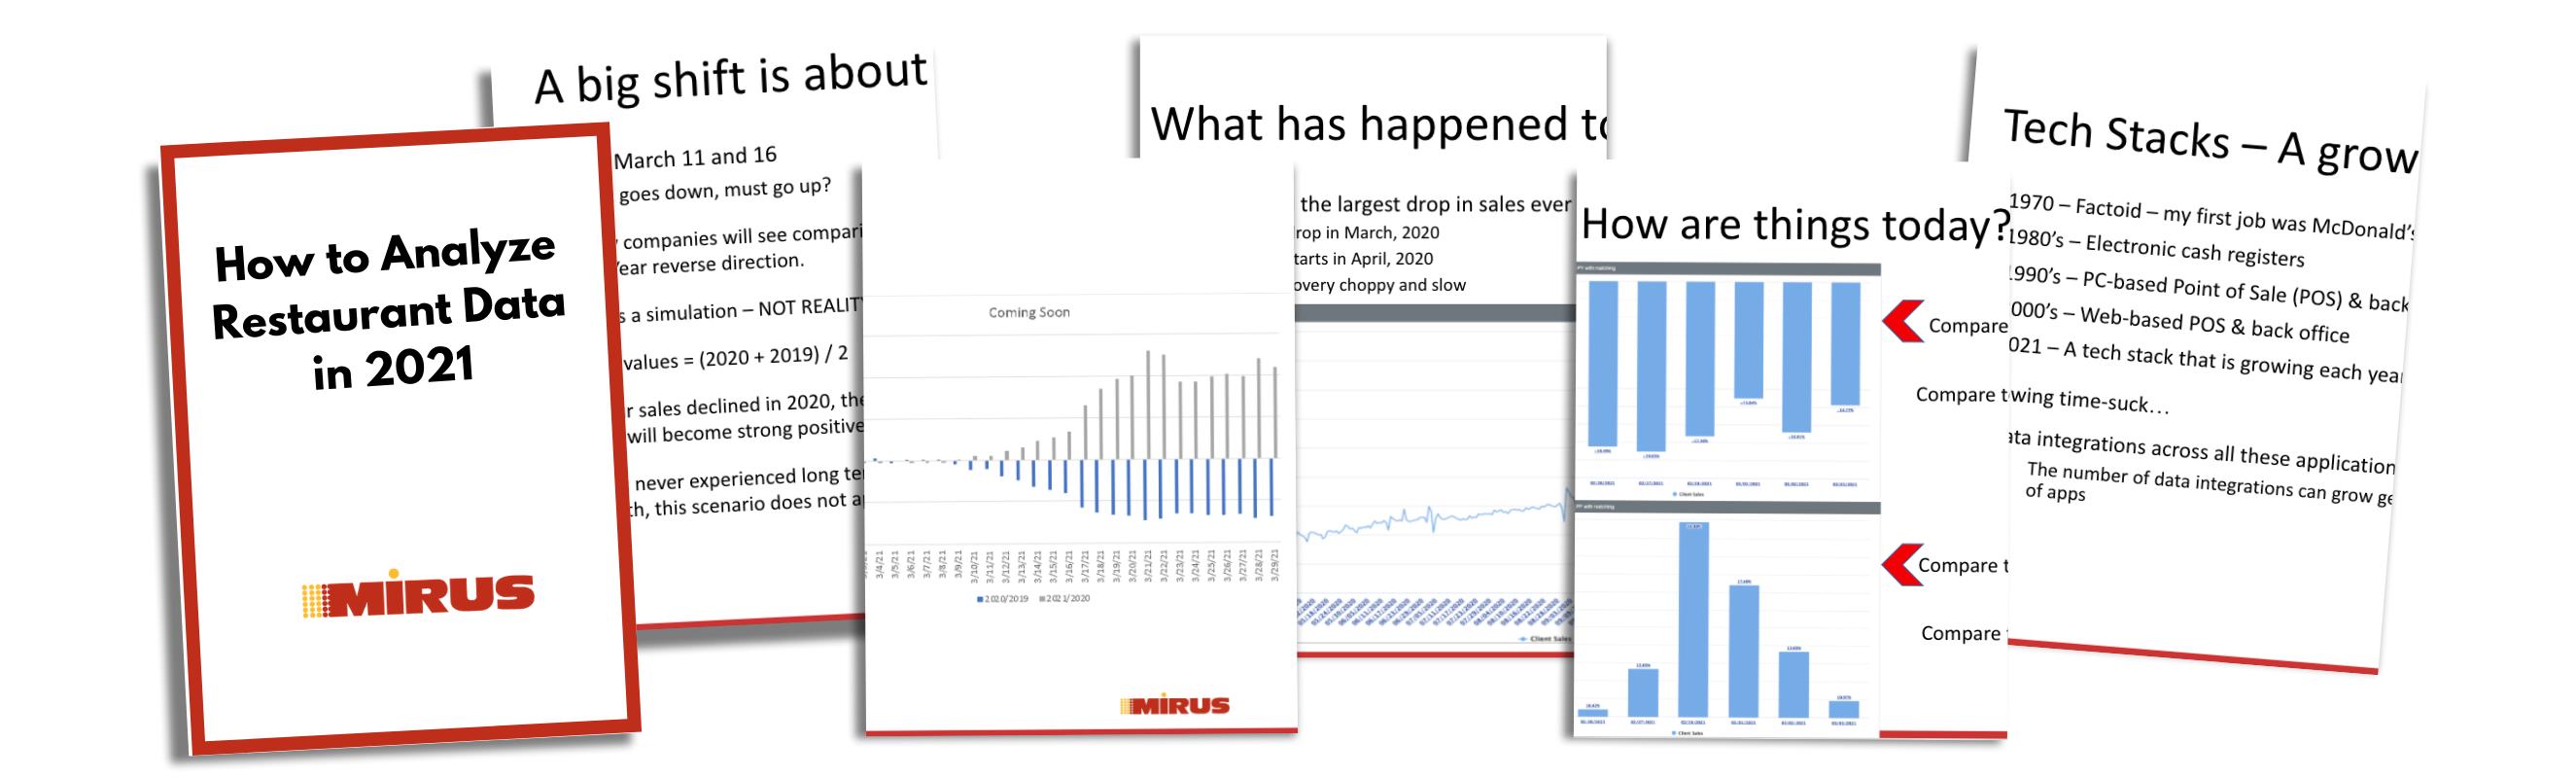 How to Analyze Restaurant Data in 2021